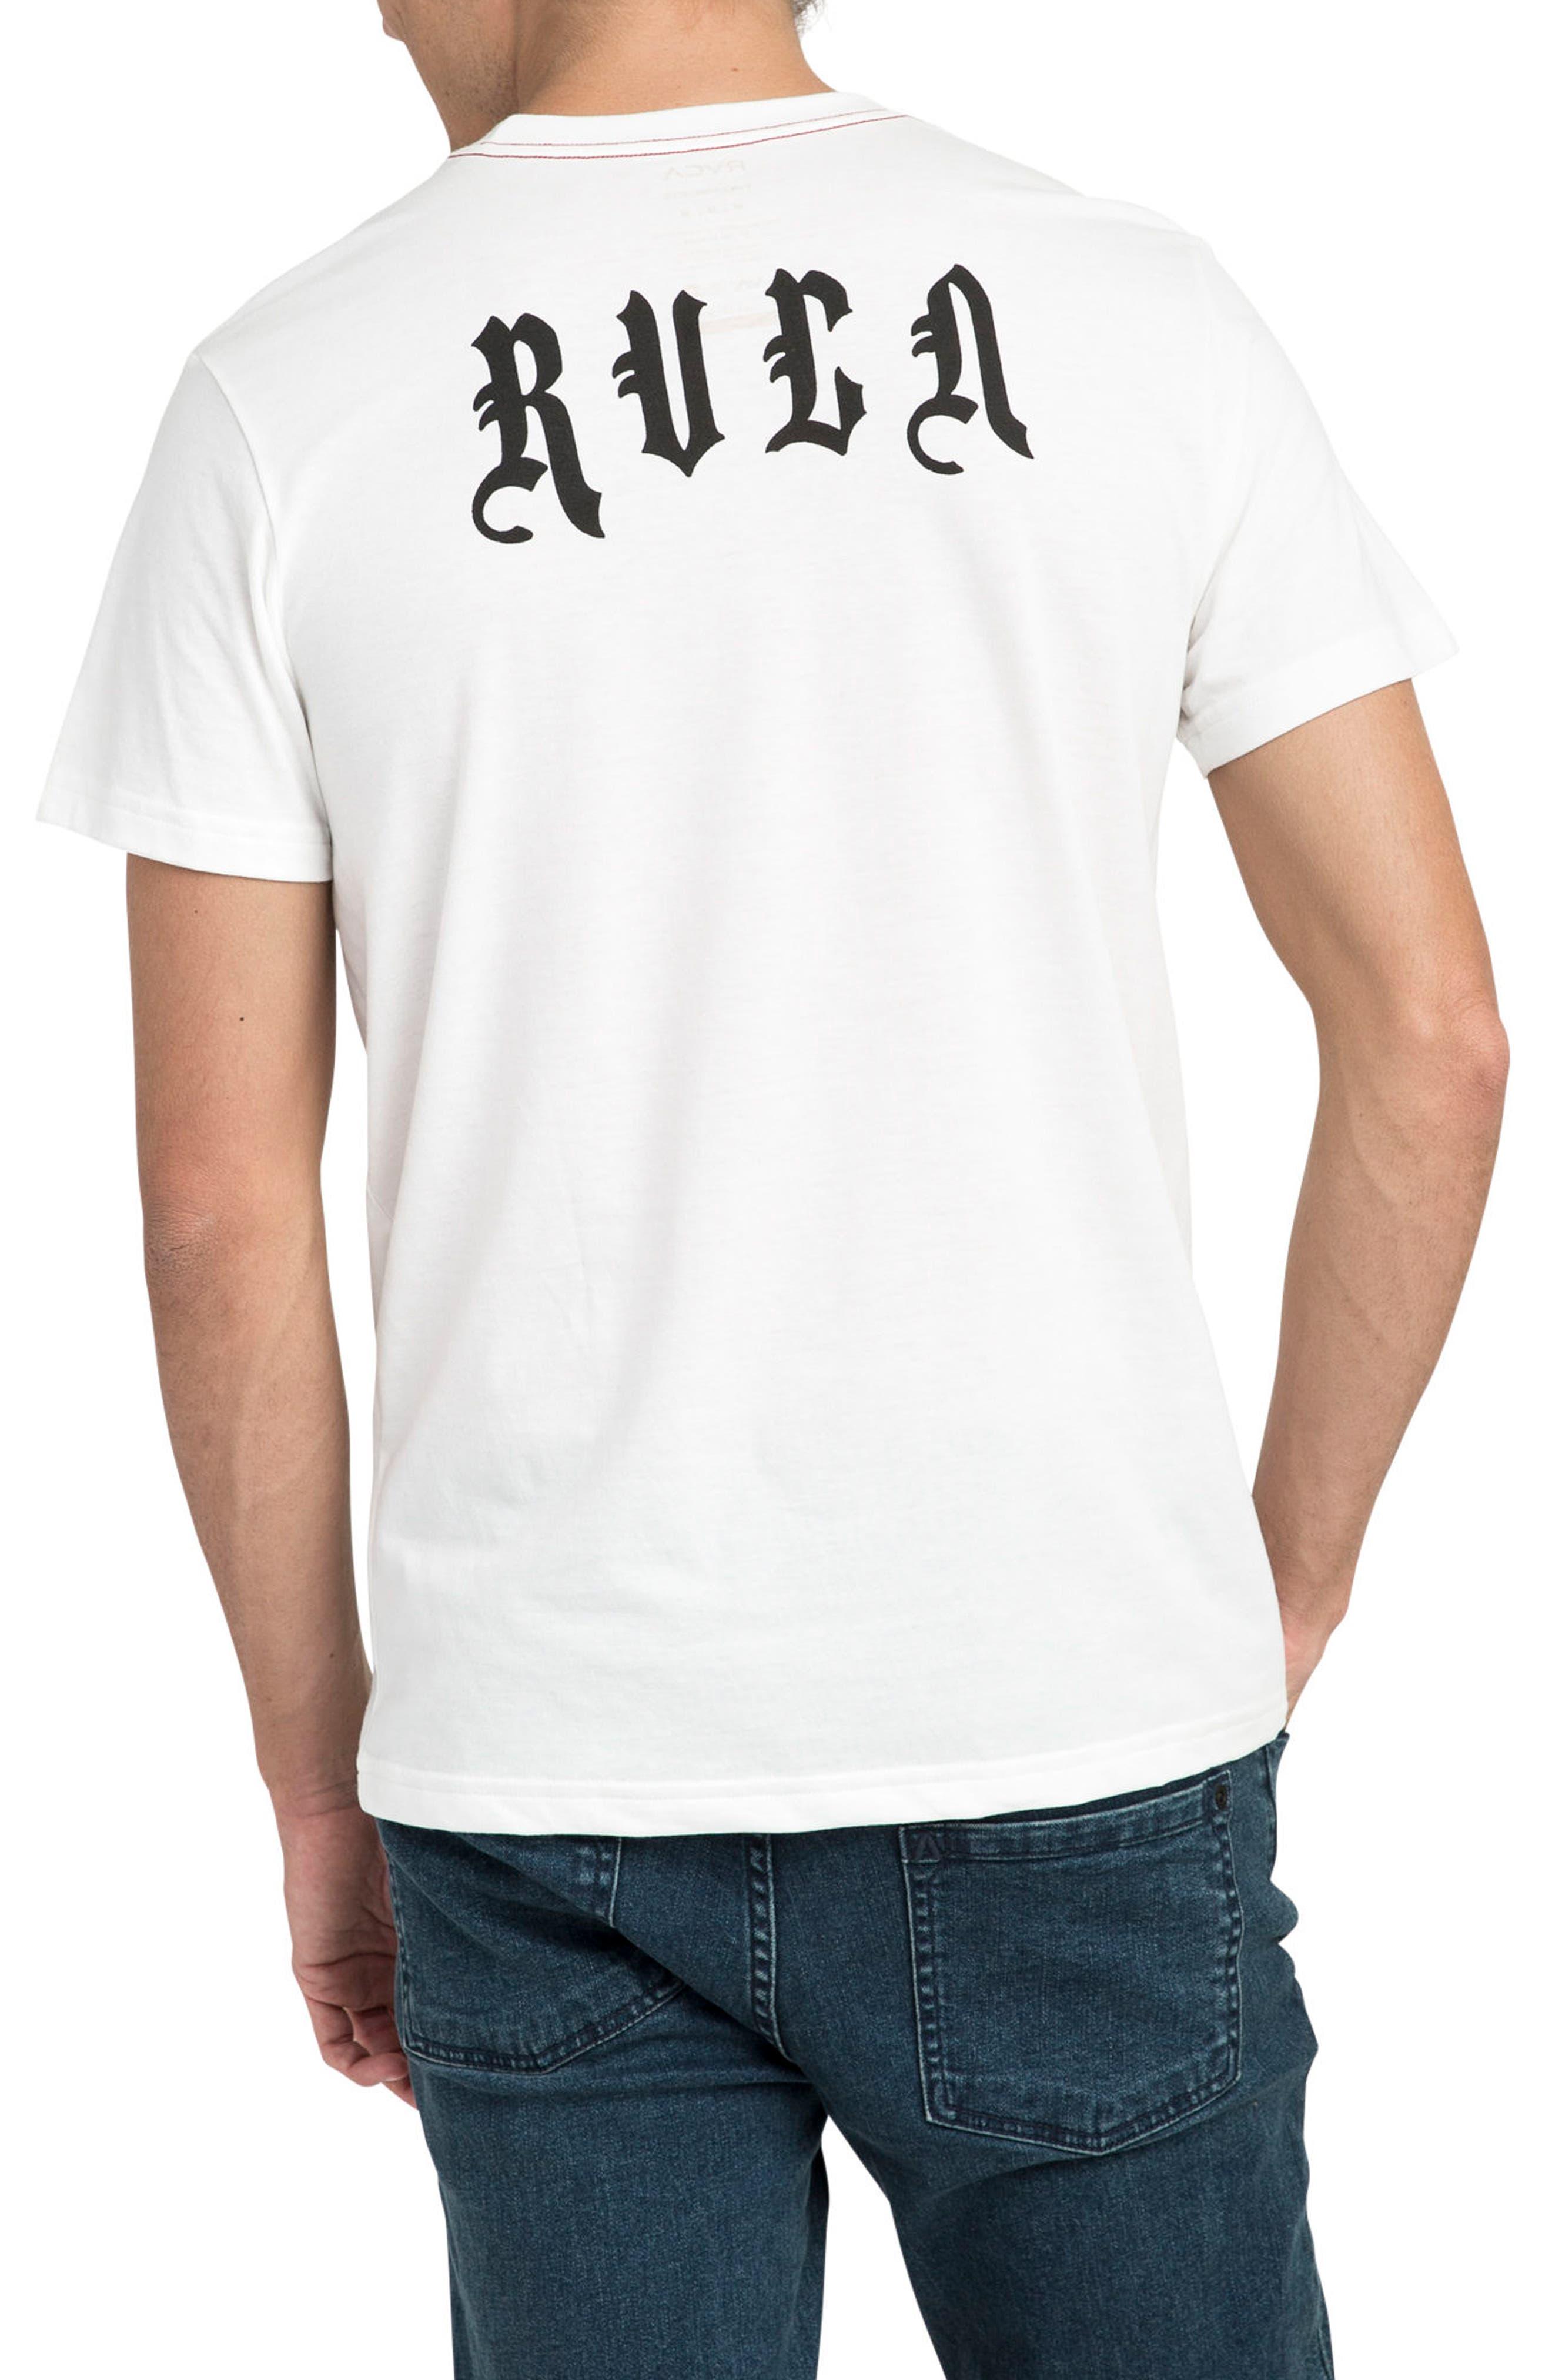 Dmote O.E. Graphic T-Shirt,                             Alternate thumbnail 2, color,                             Antique White